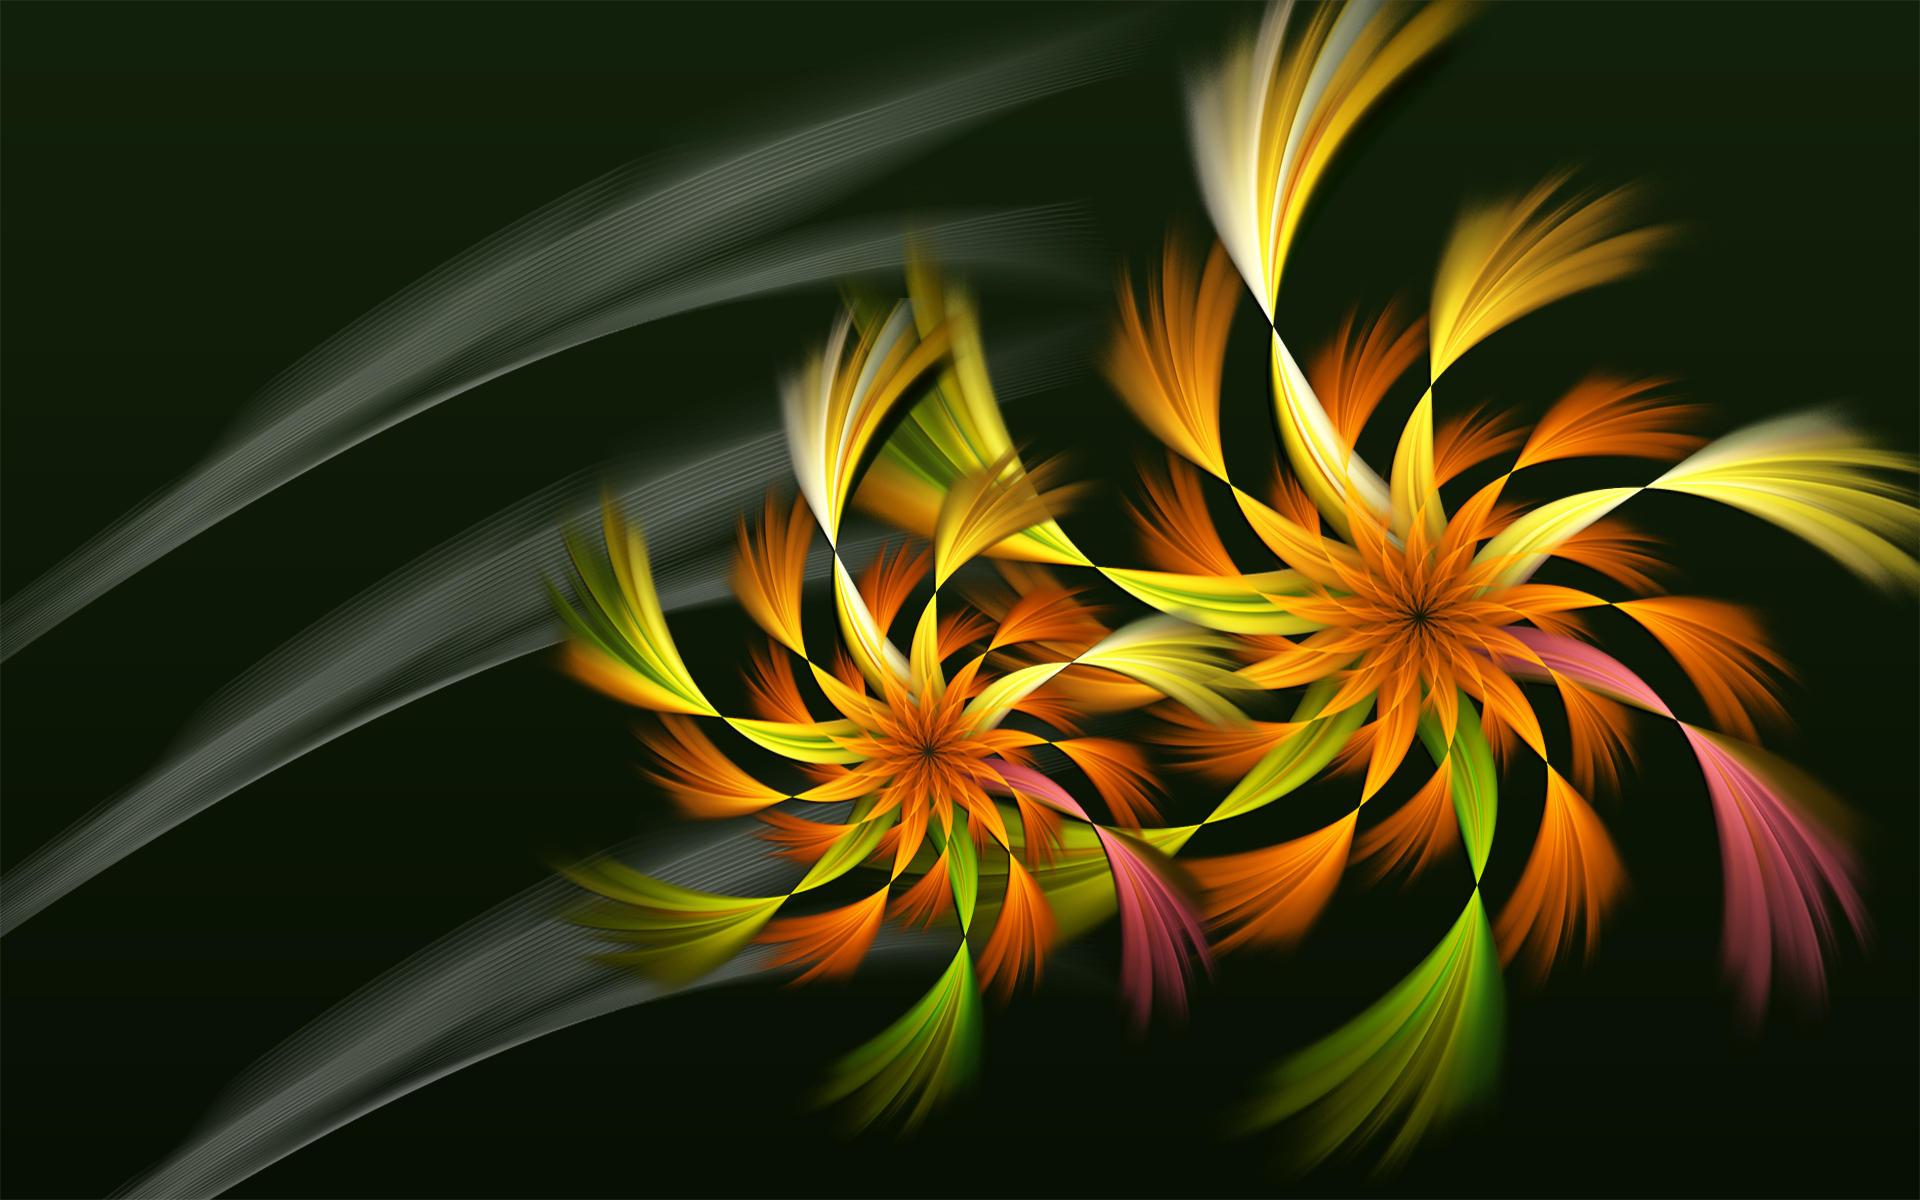 Shaggy Autumn Blooms by Frankief